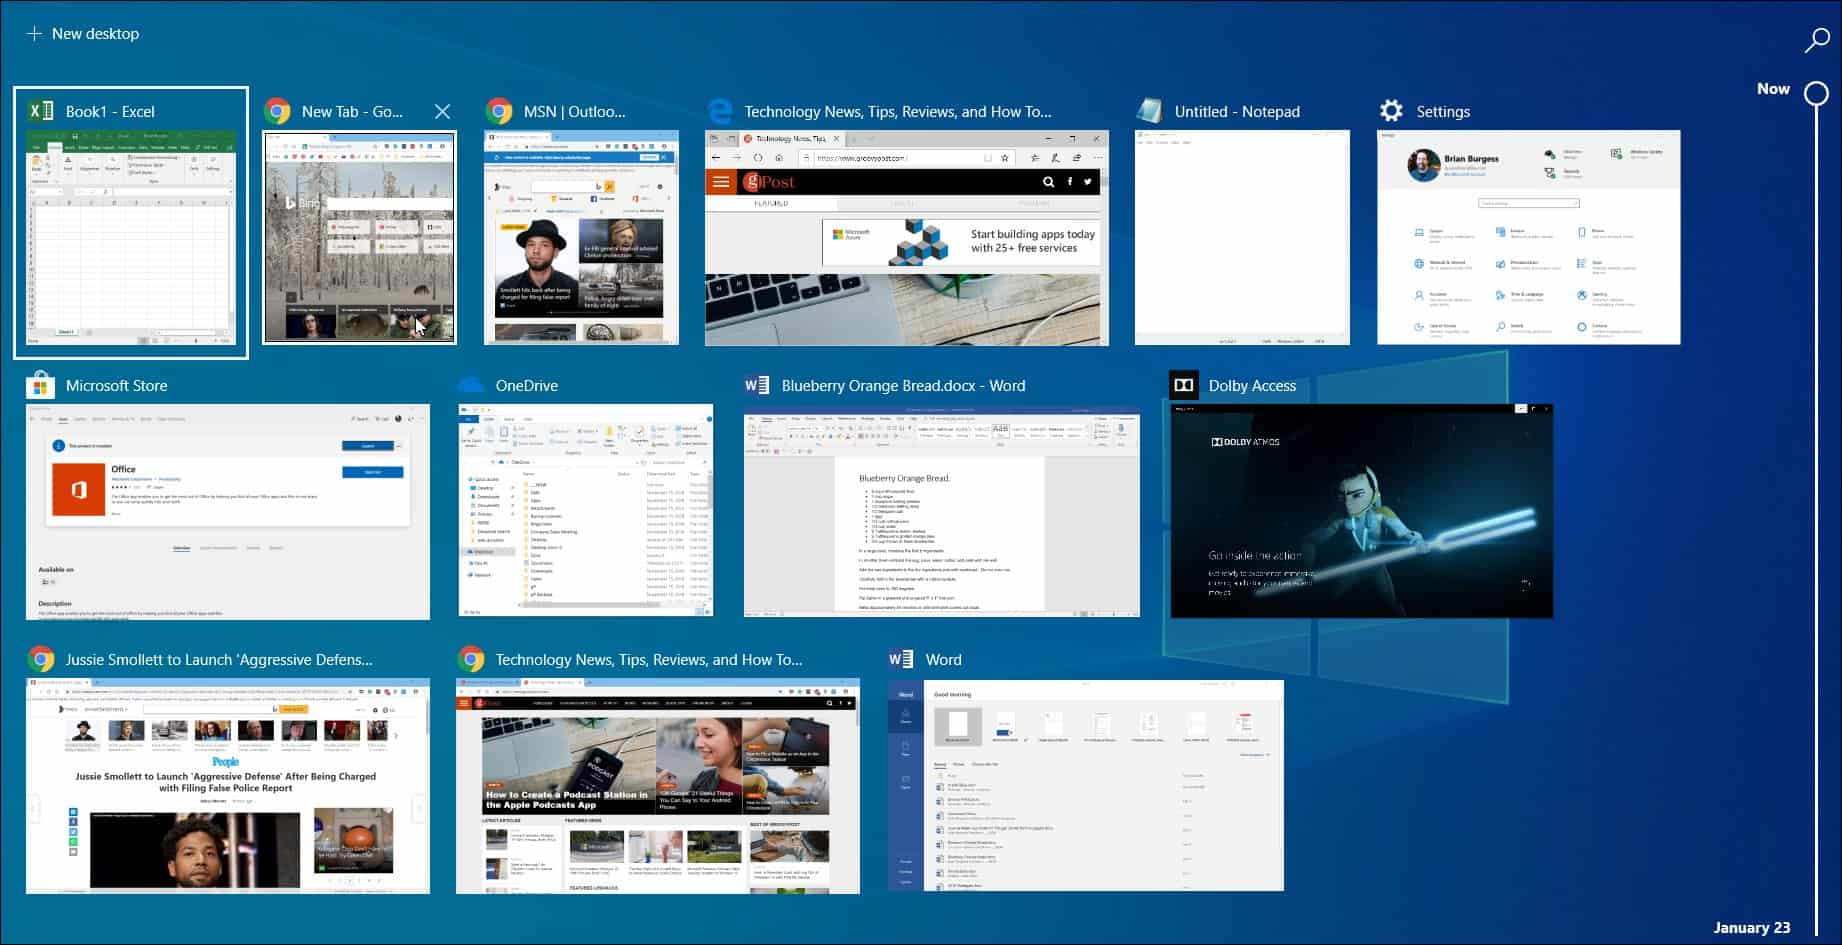 Chrome Activity Windows 10 Timeline